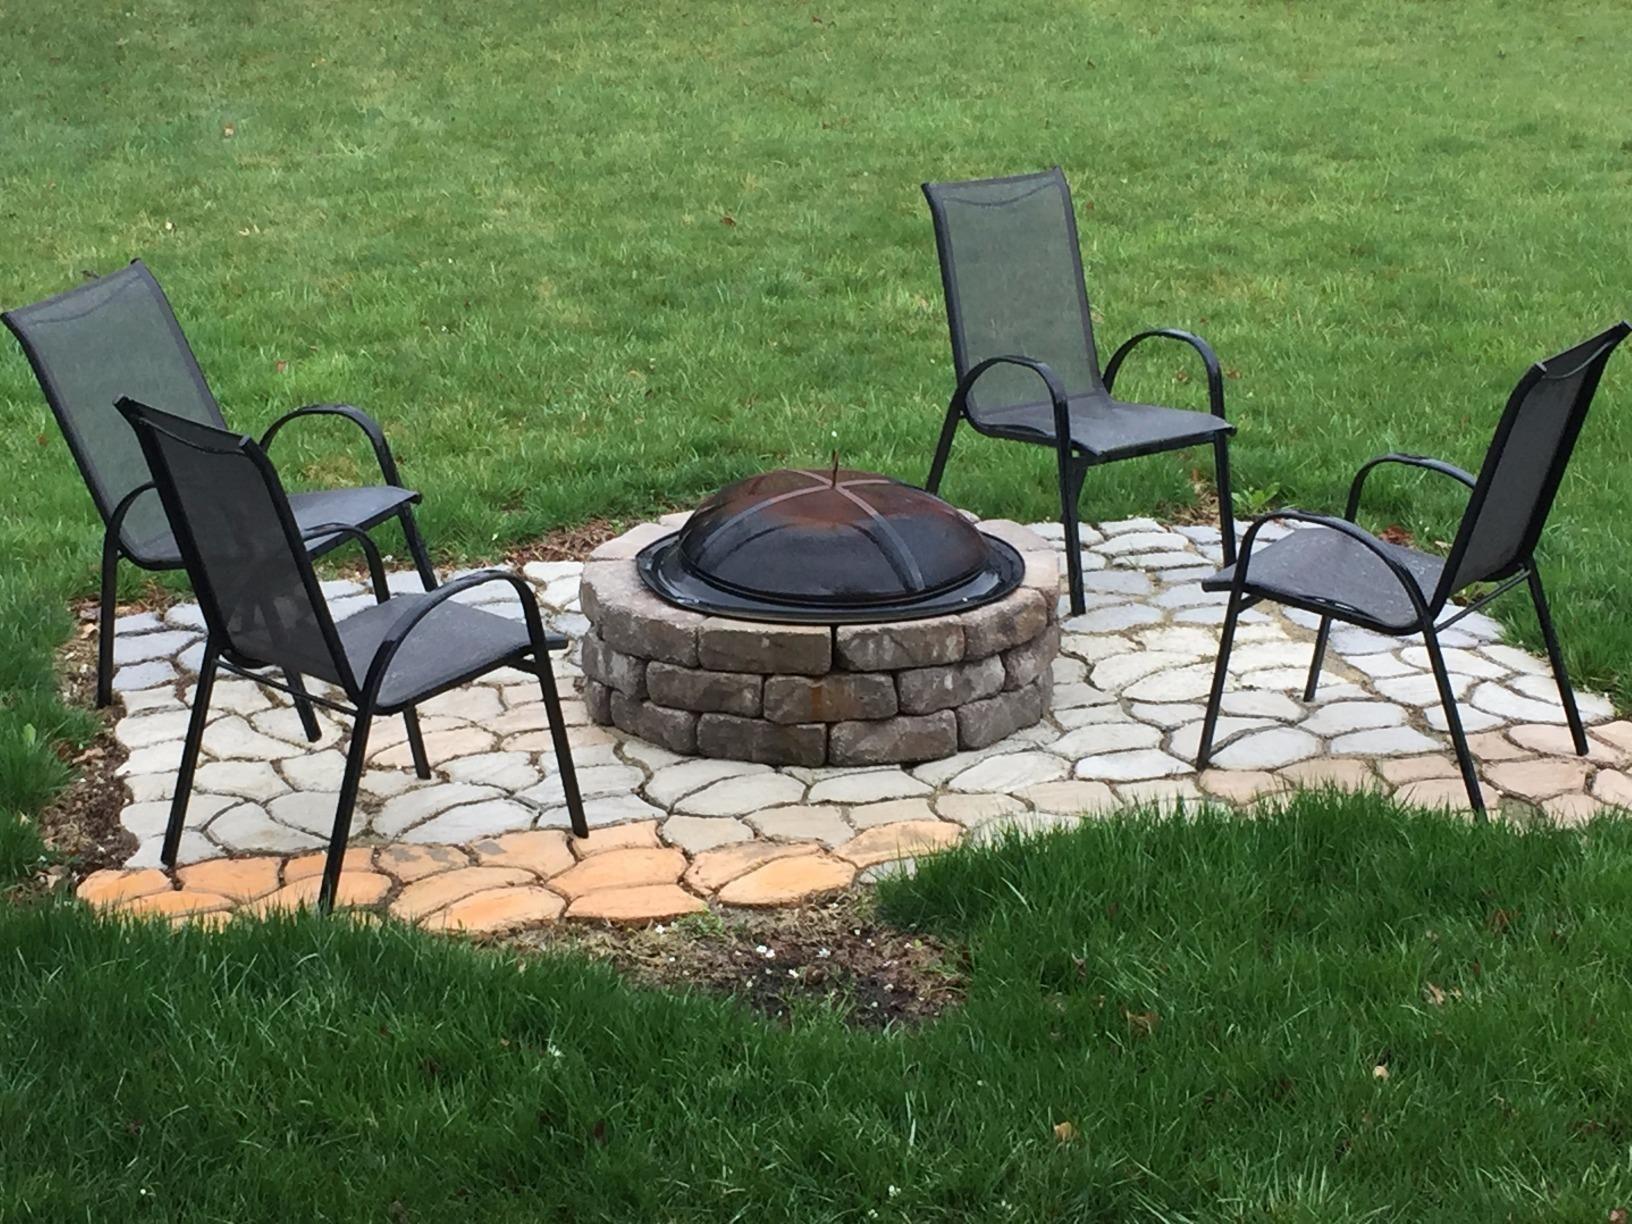 Amazon.com : Scepter 04241 Pathmate Random Stone Mold : Outdoor ...